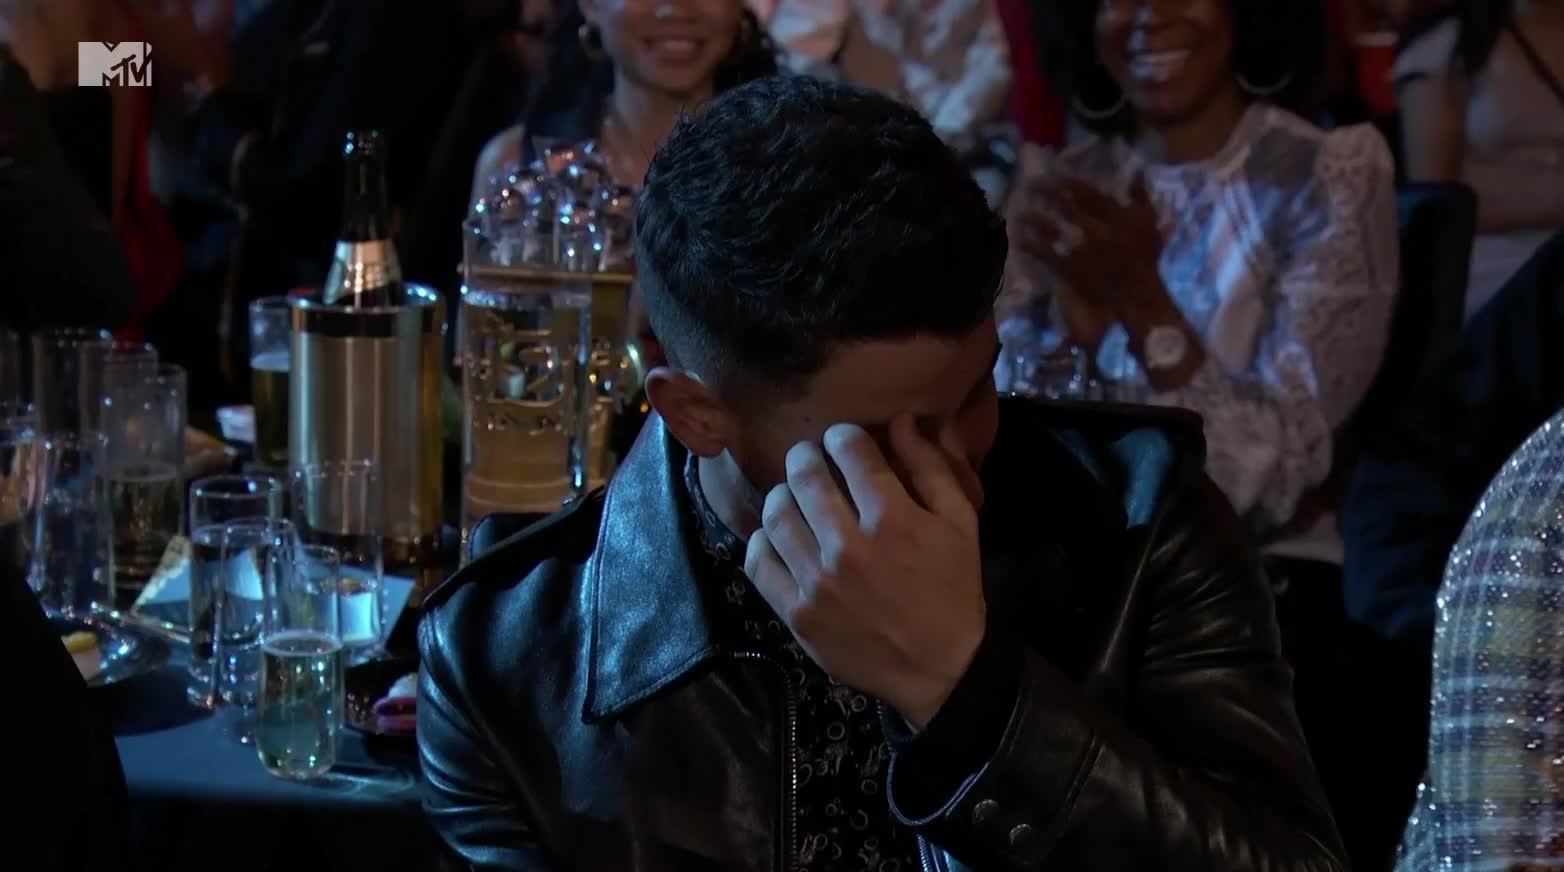 MTV Movie Awards 2018, MTVMovieAwards2018, celebrity, celebs, nick jonas, Nick Jonas MTV Movie Awards GIFs